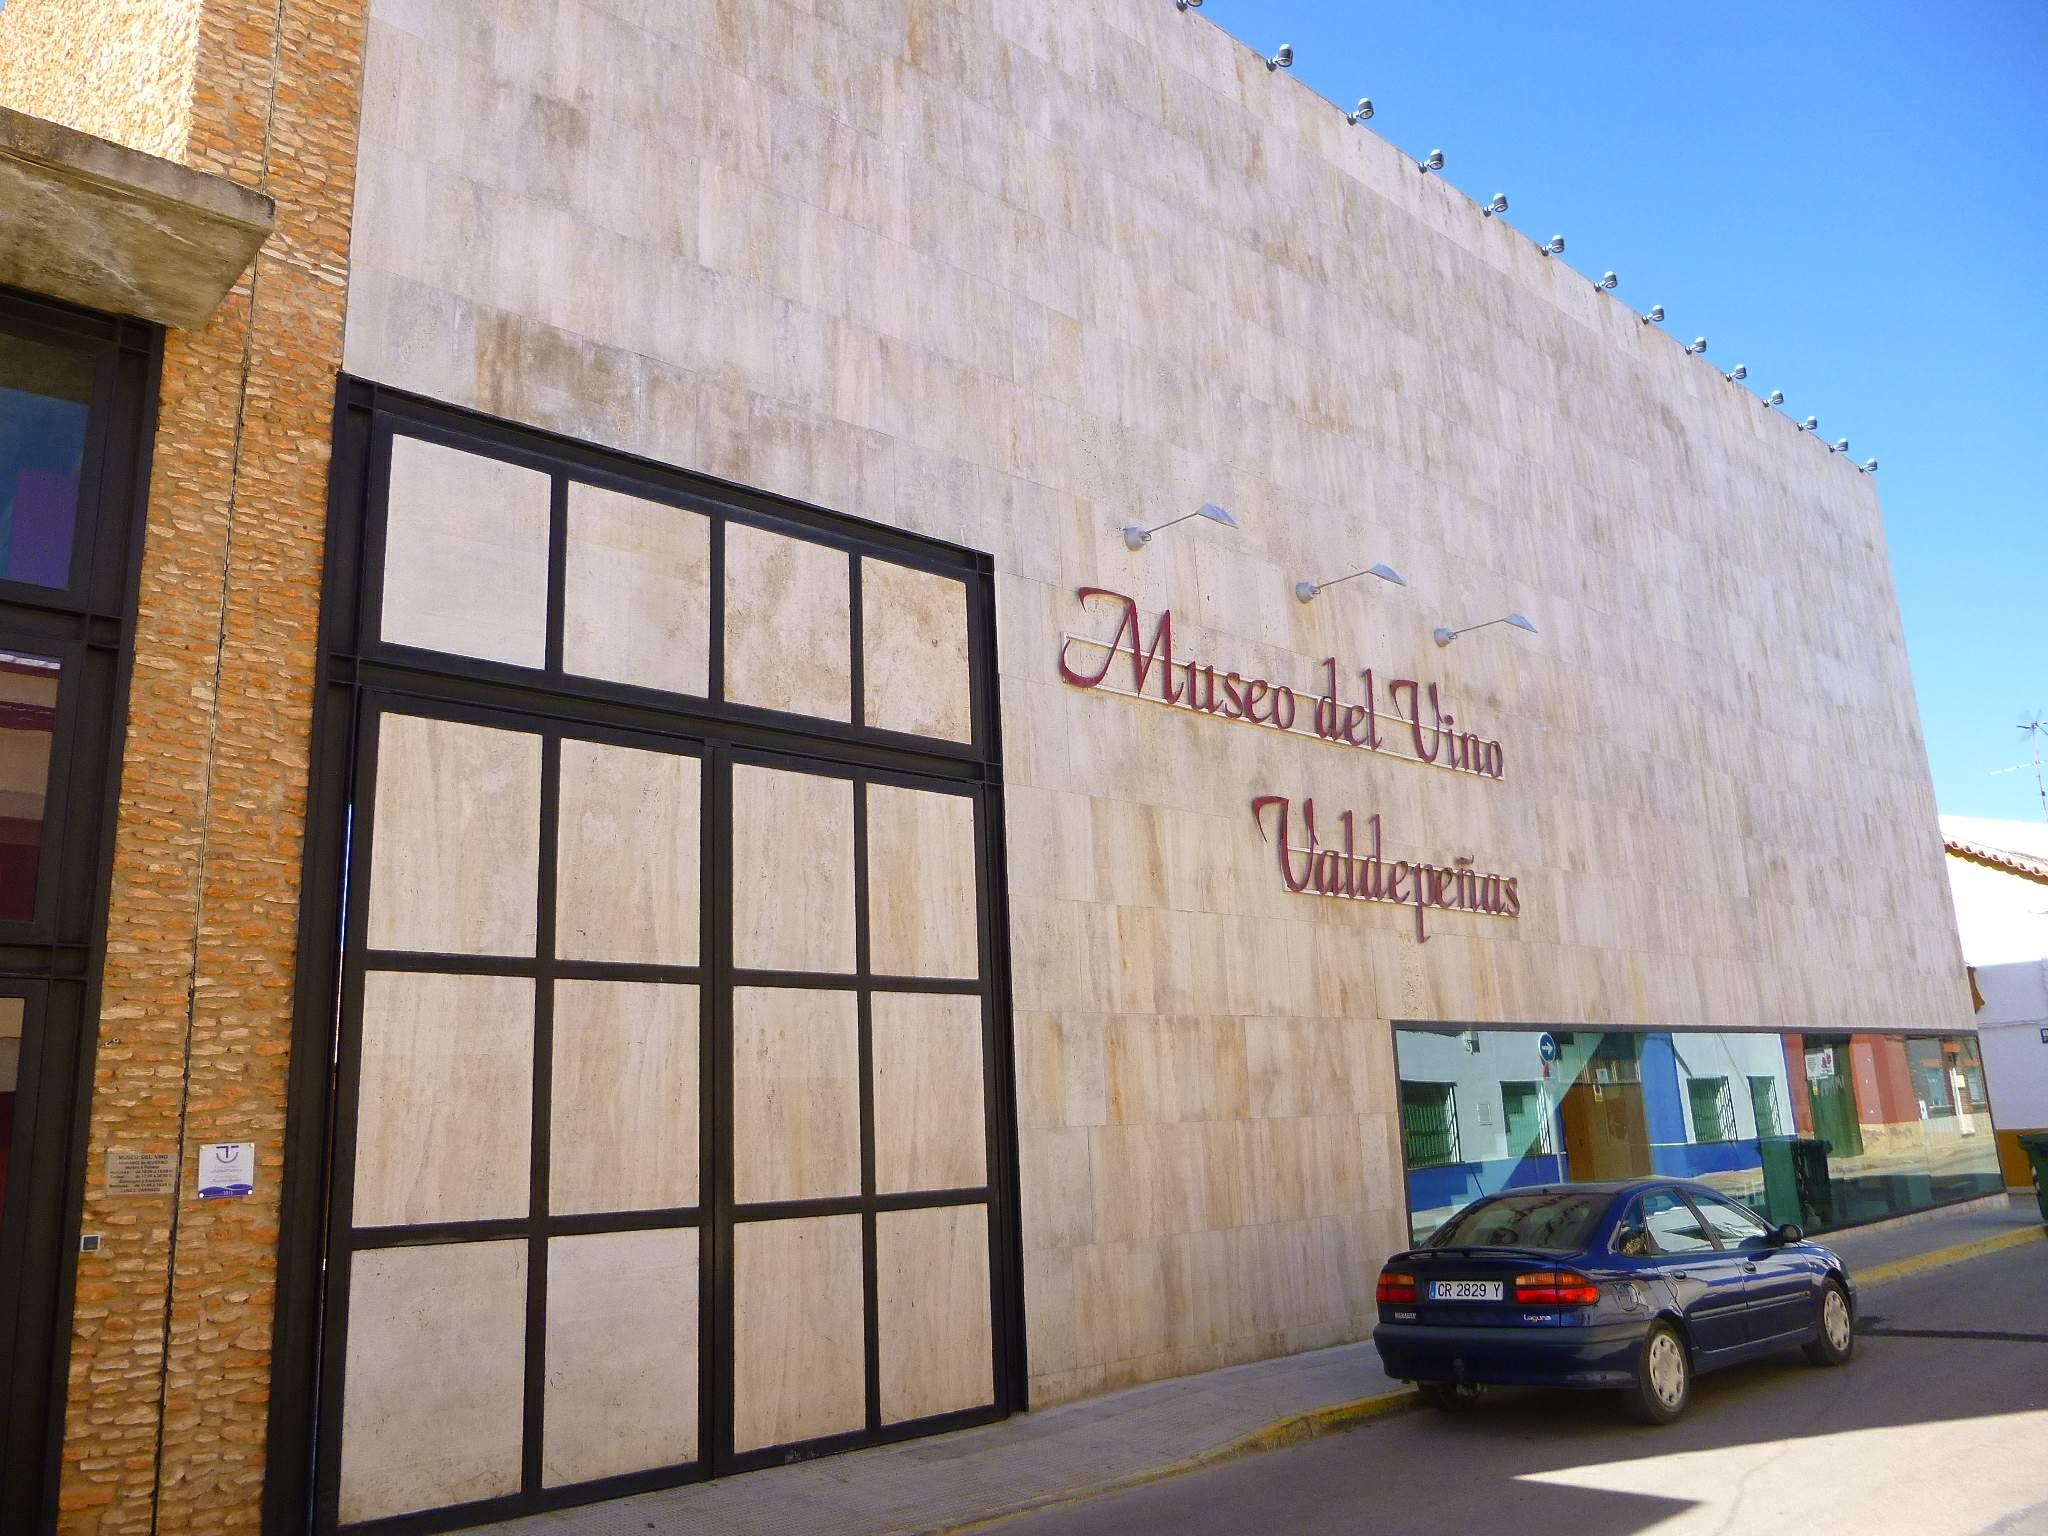 Museo Del Vino.File Valdepenas Museo Del Vino 3 Jpg Wikimedia Commons